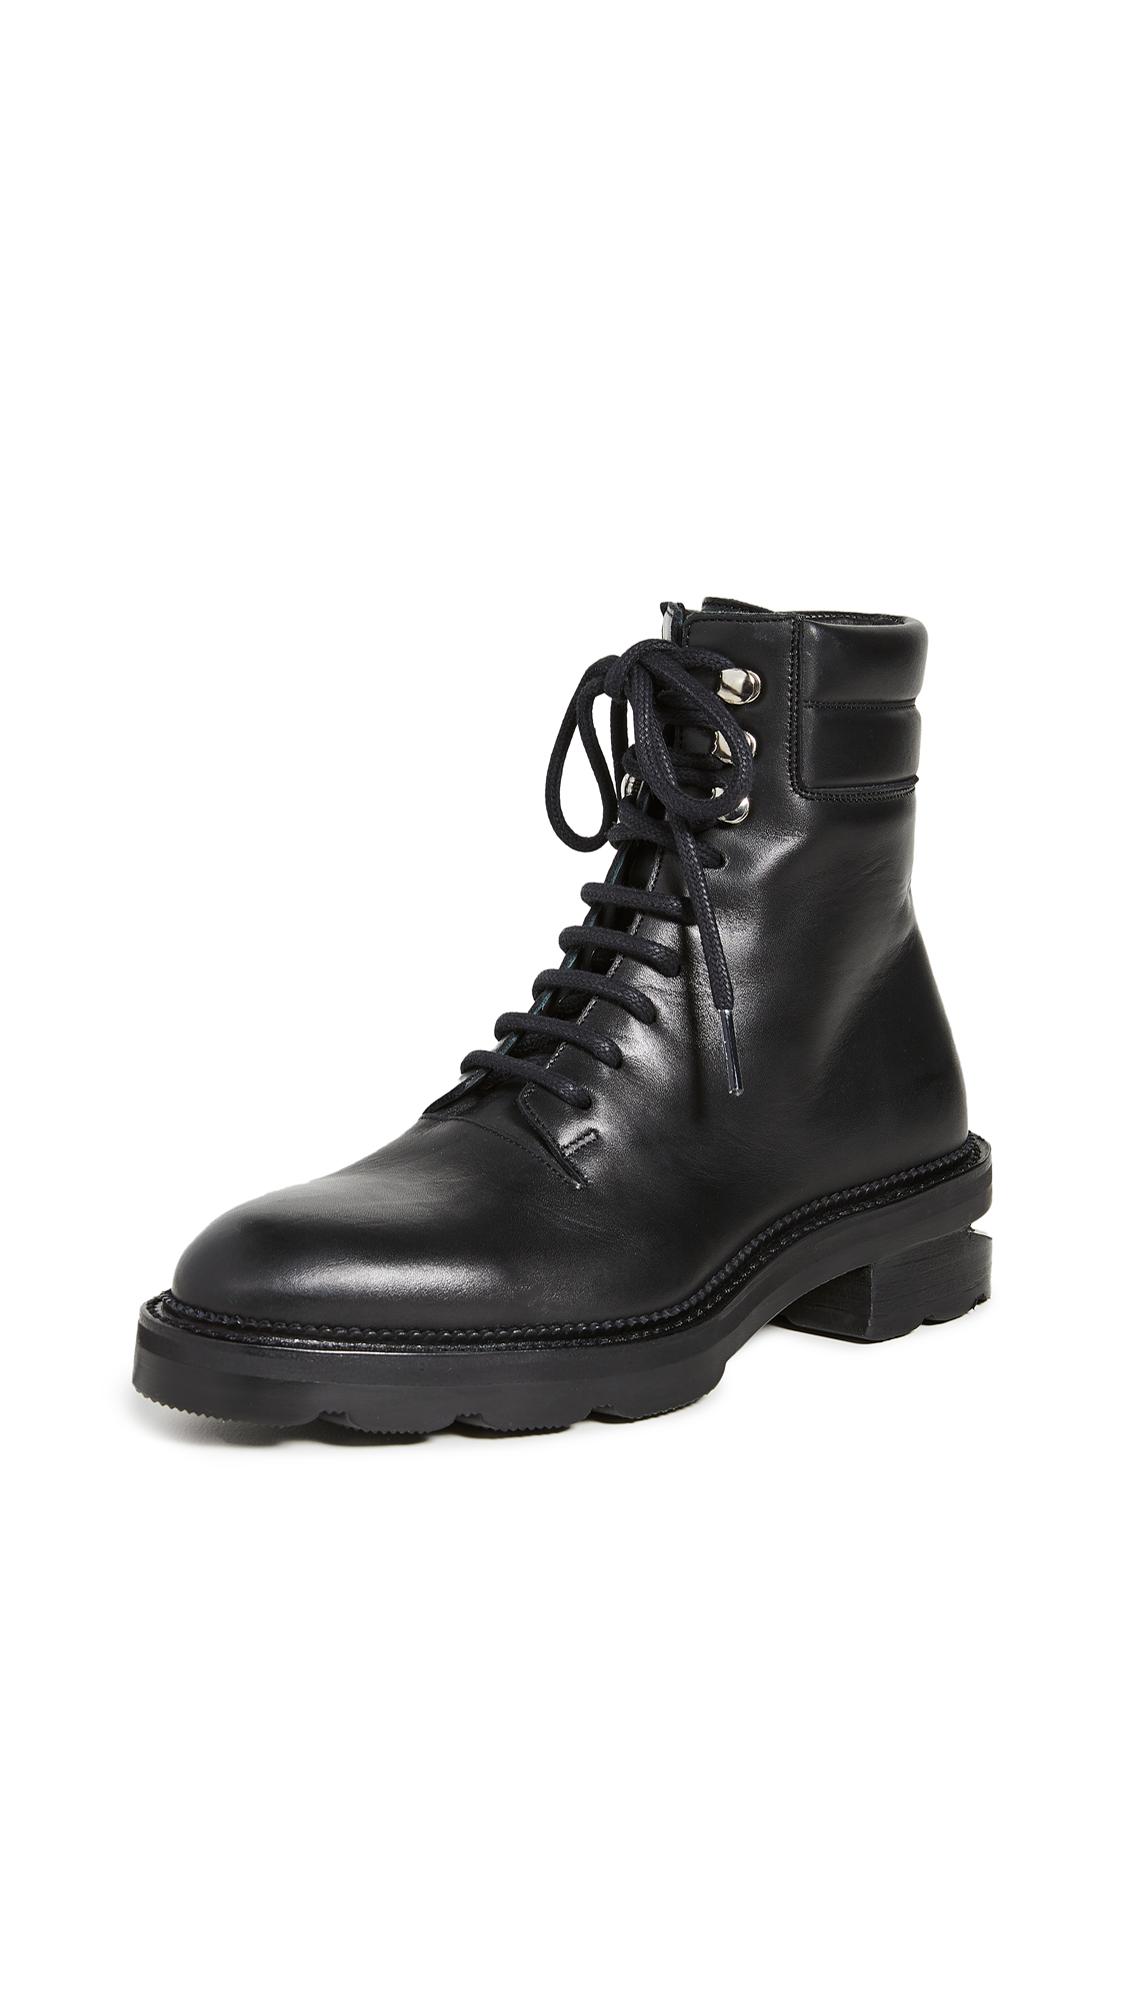 Buy Alexander Wang Andy Hiker Boots online, shop Alexander Wang